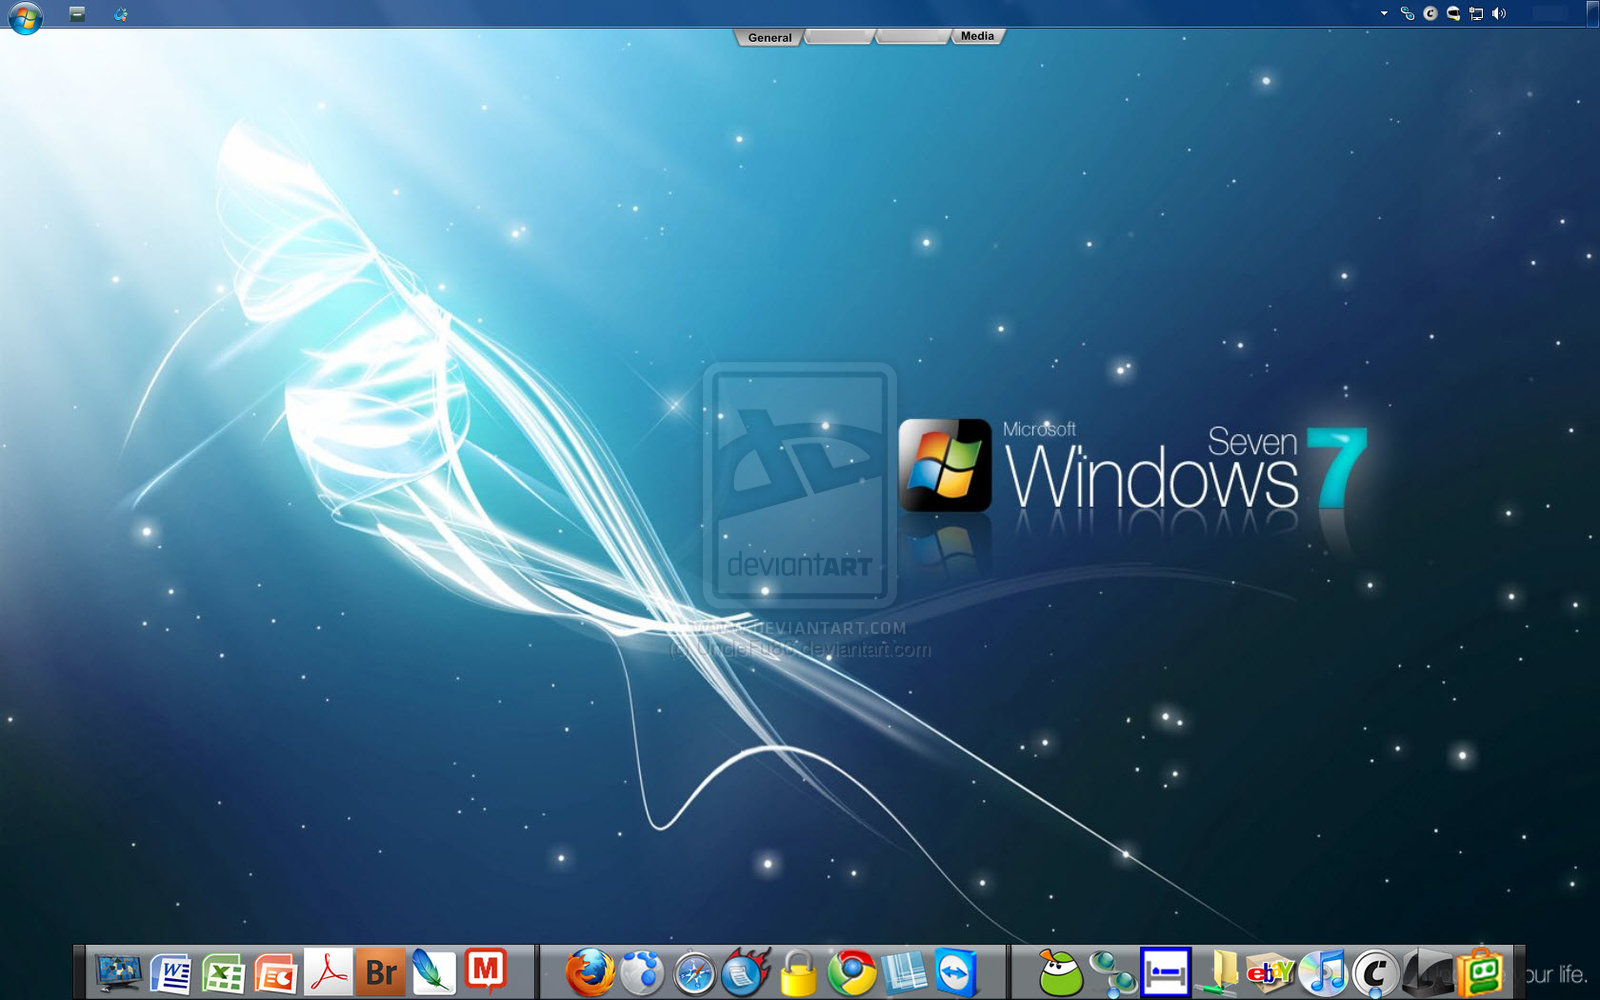 Windows 7 professional wallpaper wallpapersafari for Window 7 professional